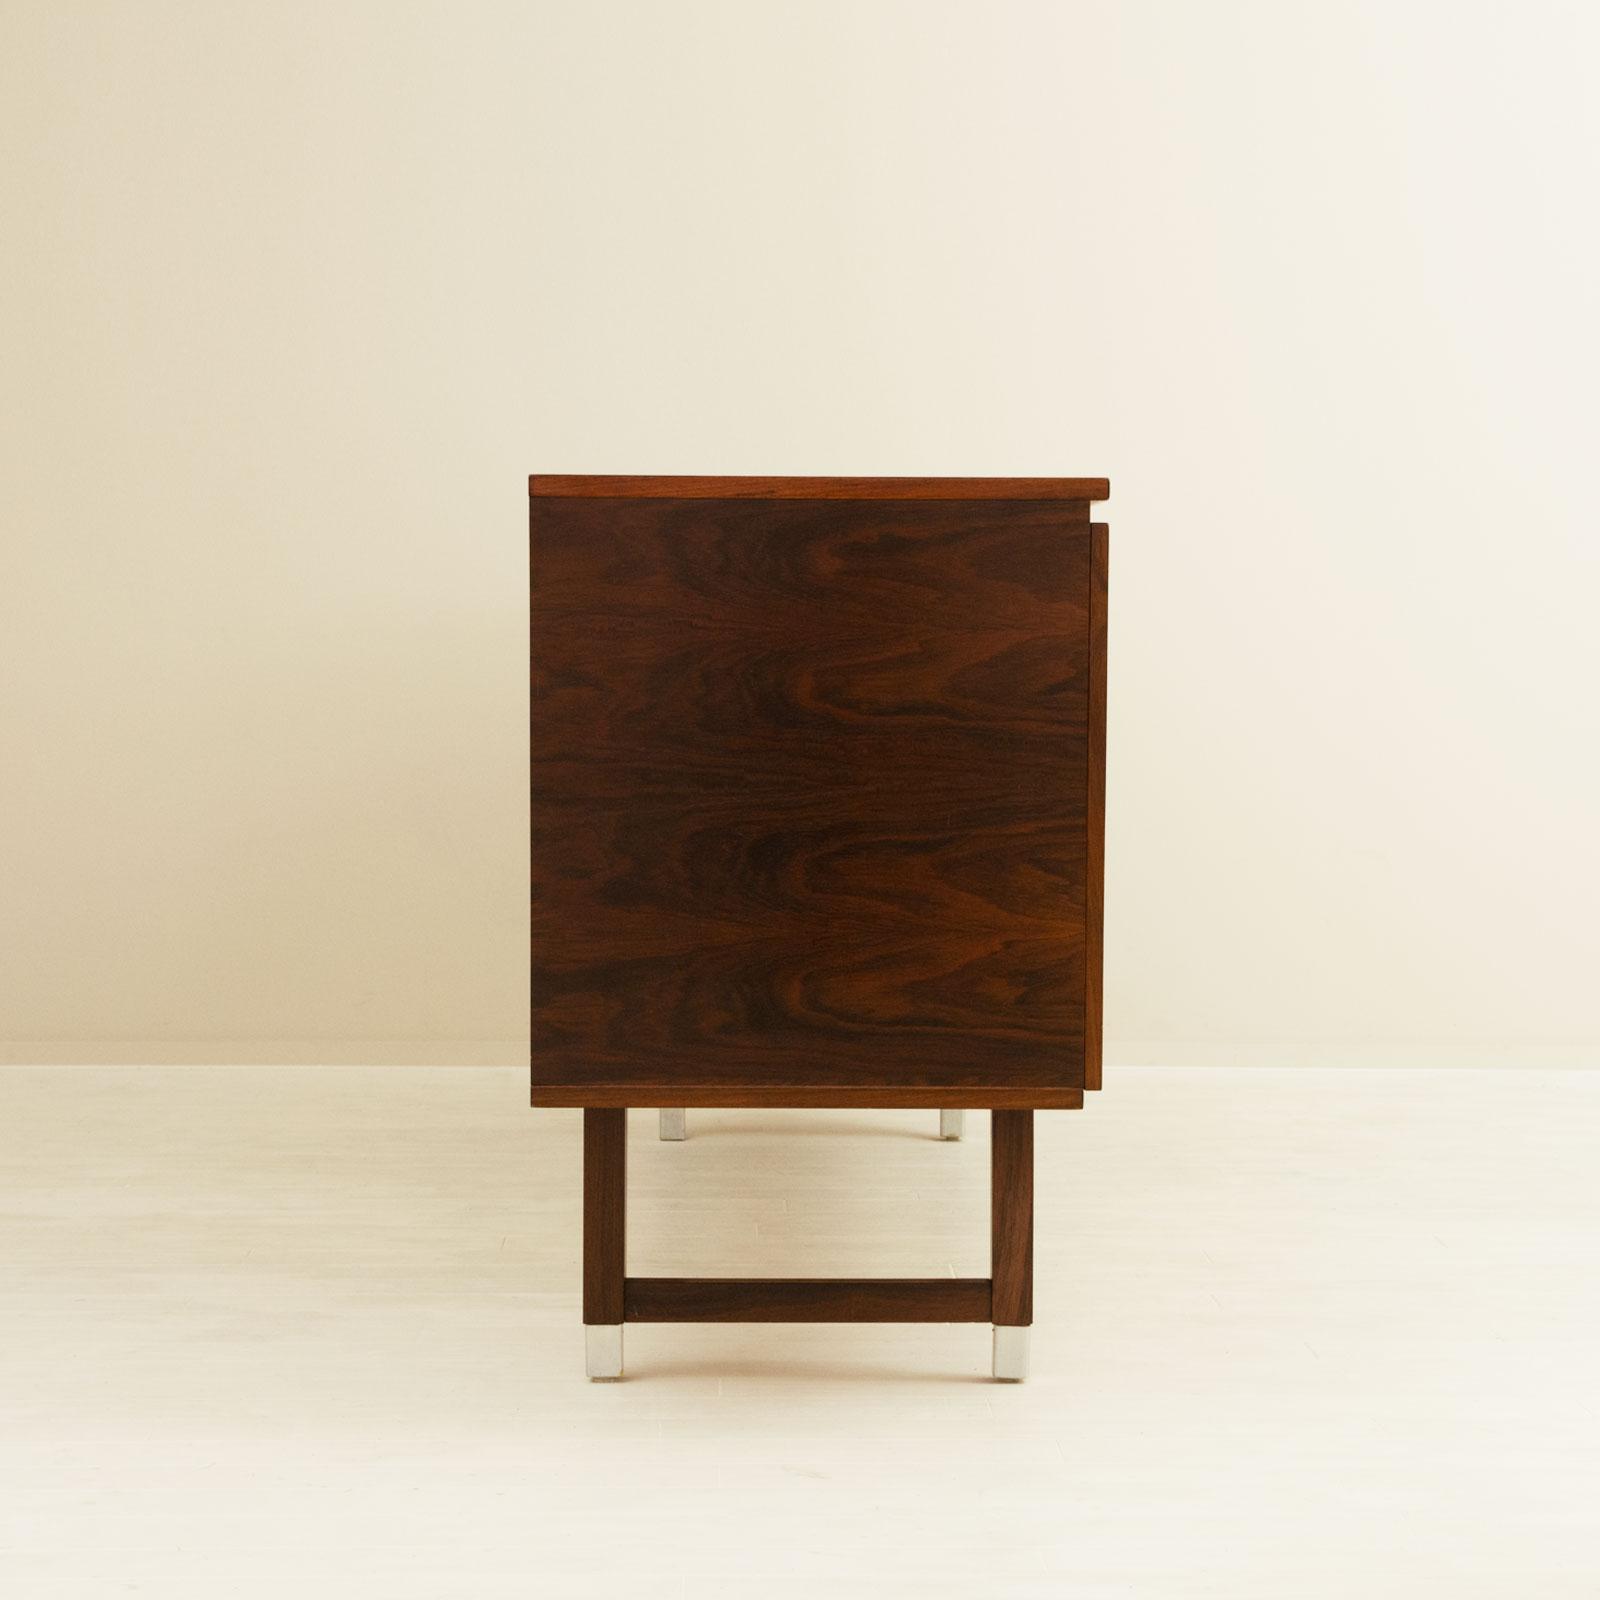 Sideboard by Kai Kristiansen